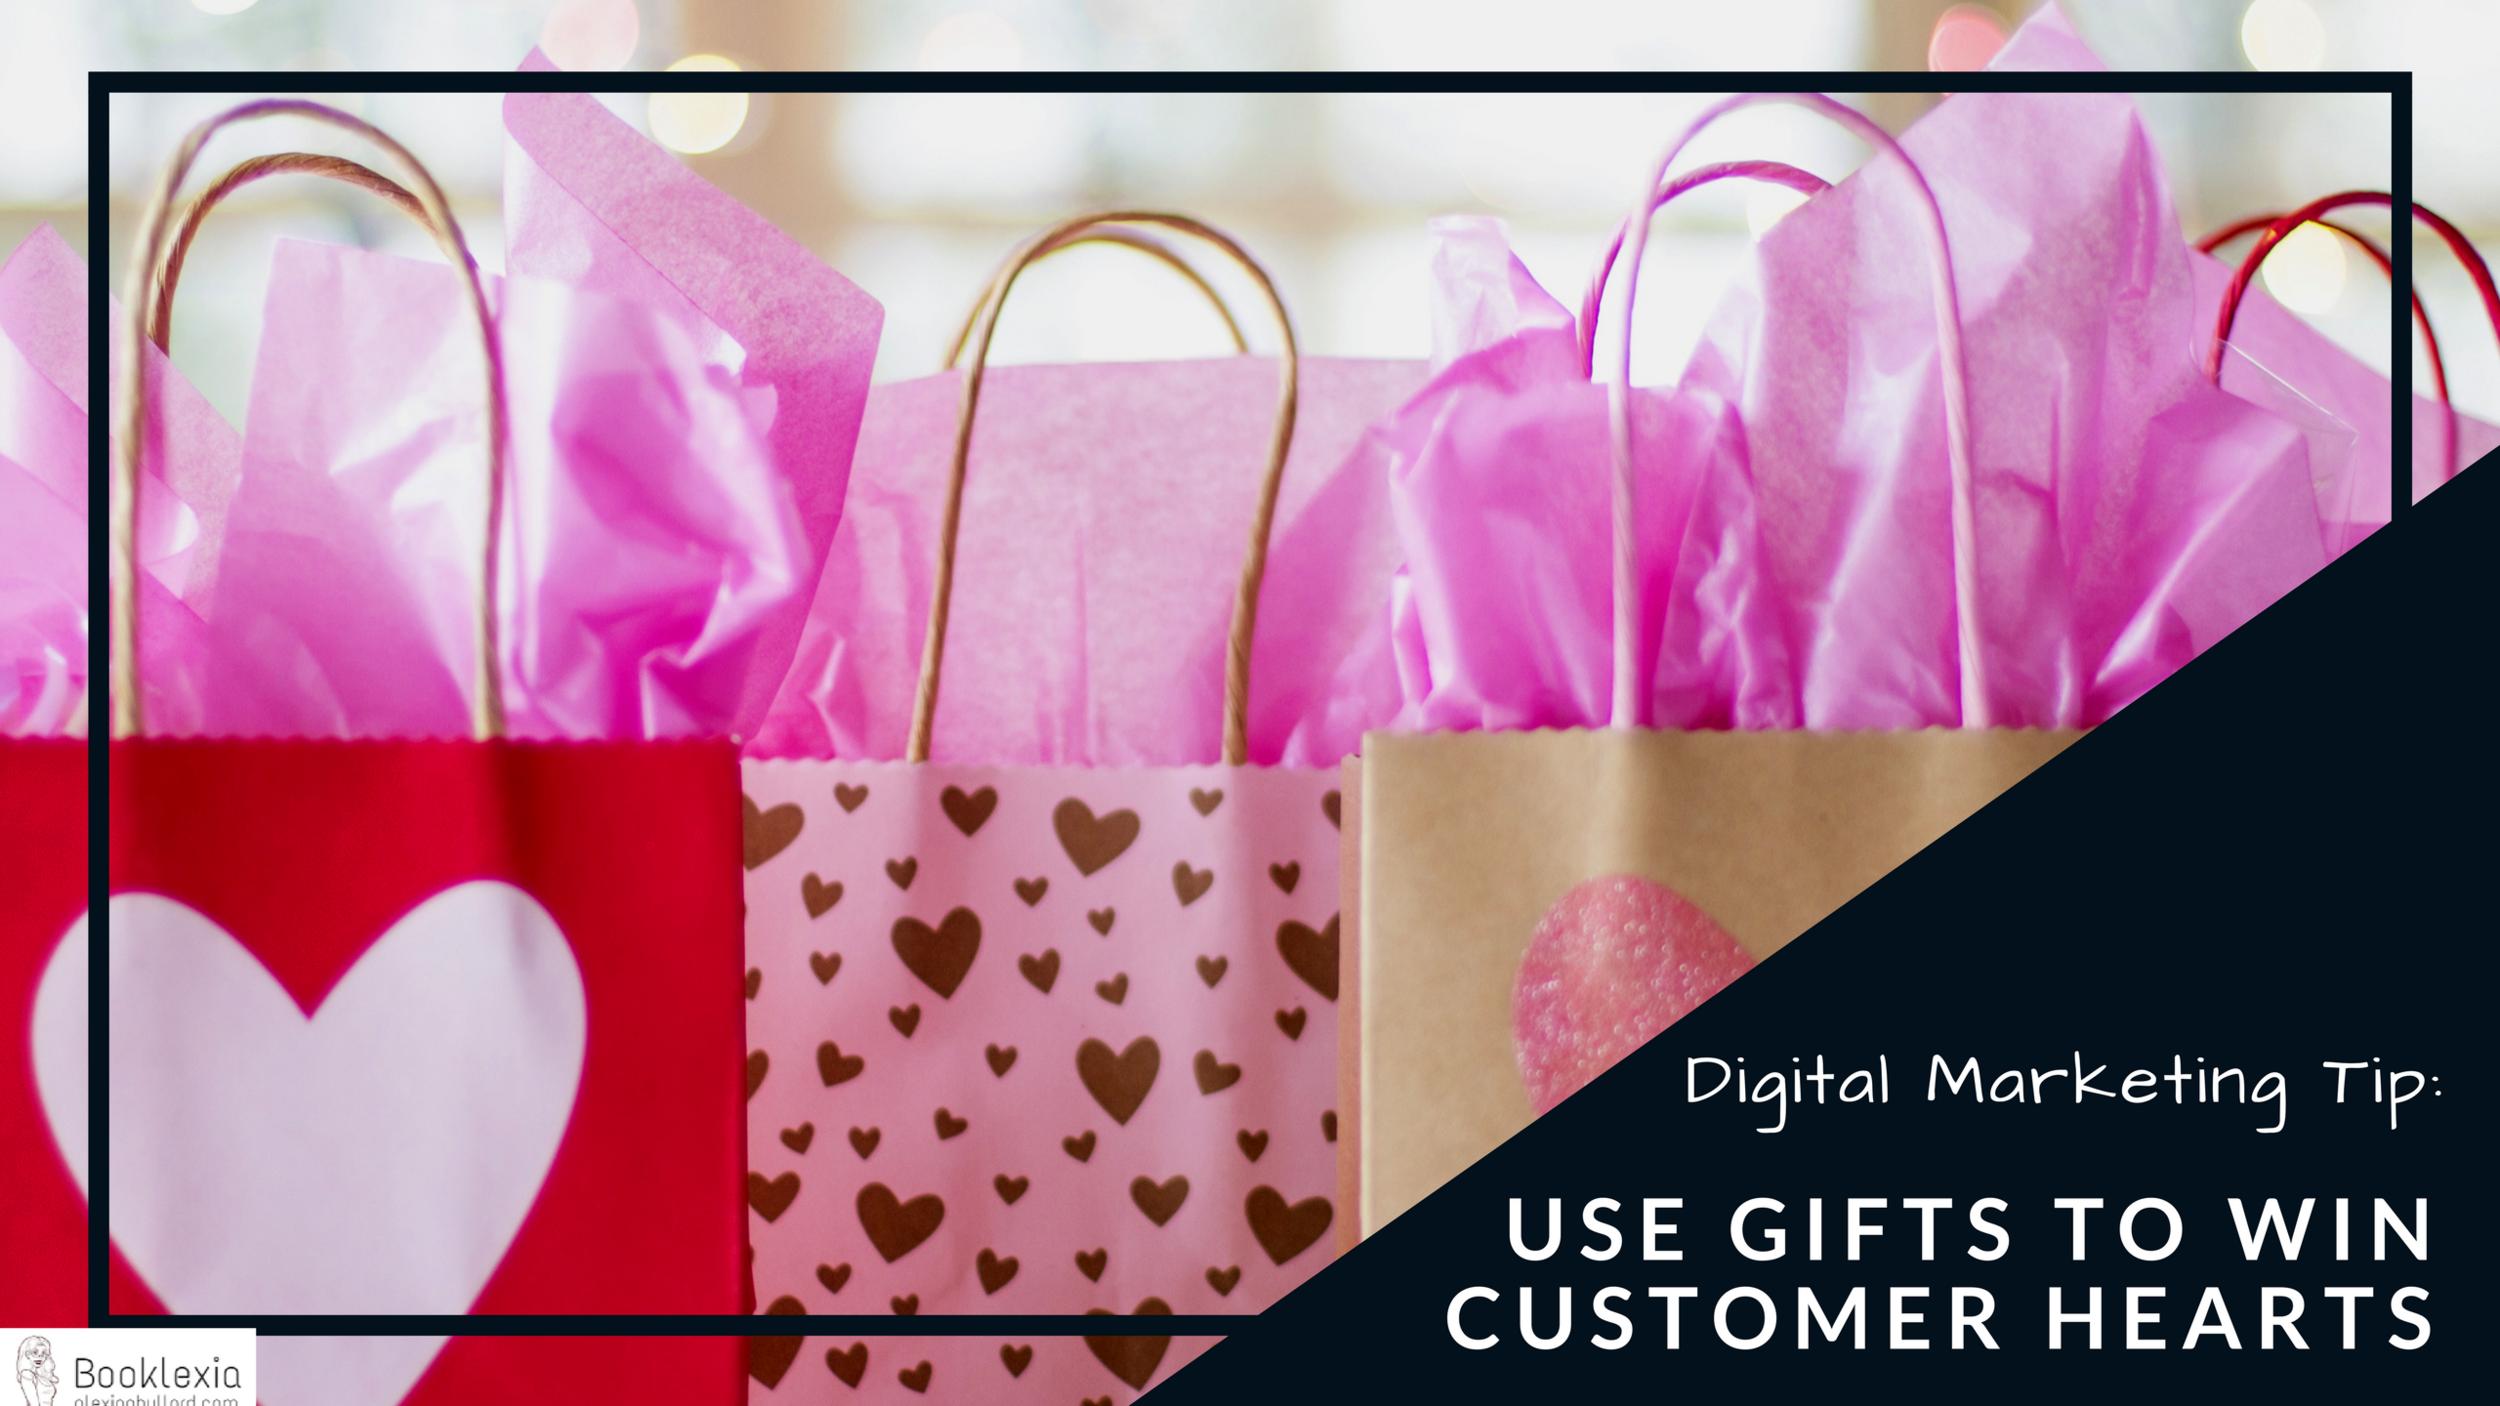 Tacoma Dispensary Marketing ; Digital Marketing Tips for Dispensaries